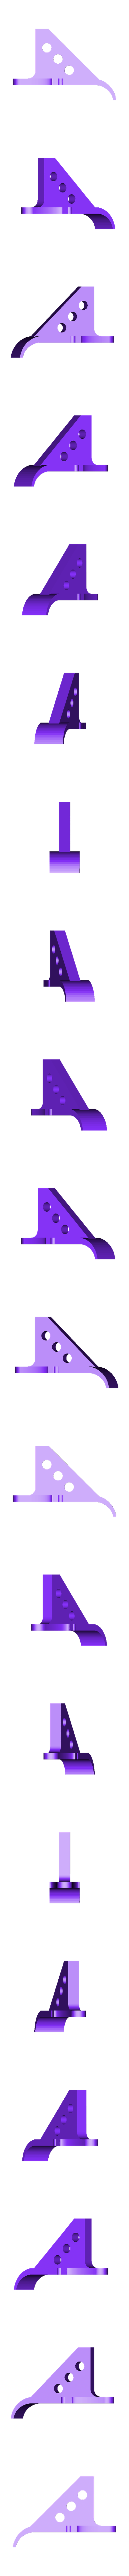 trx_bumper_lite.stl Download free STL file Traxxas 1/16 Chassis Mod • 3D printable design, Gophy